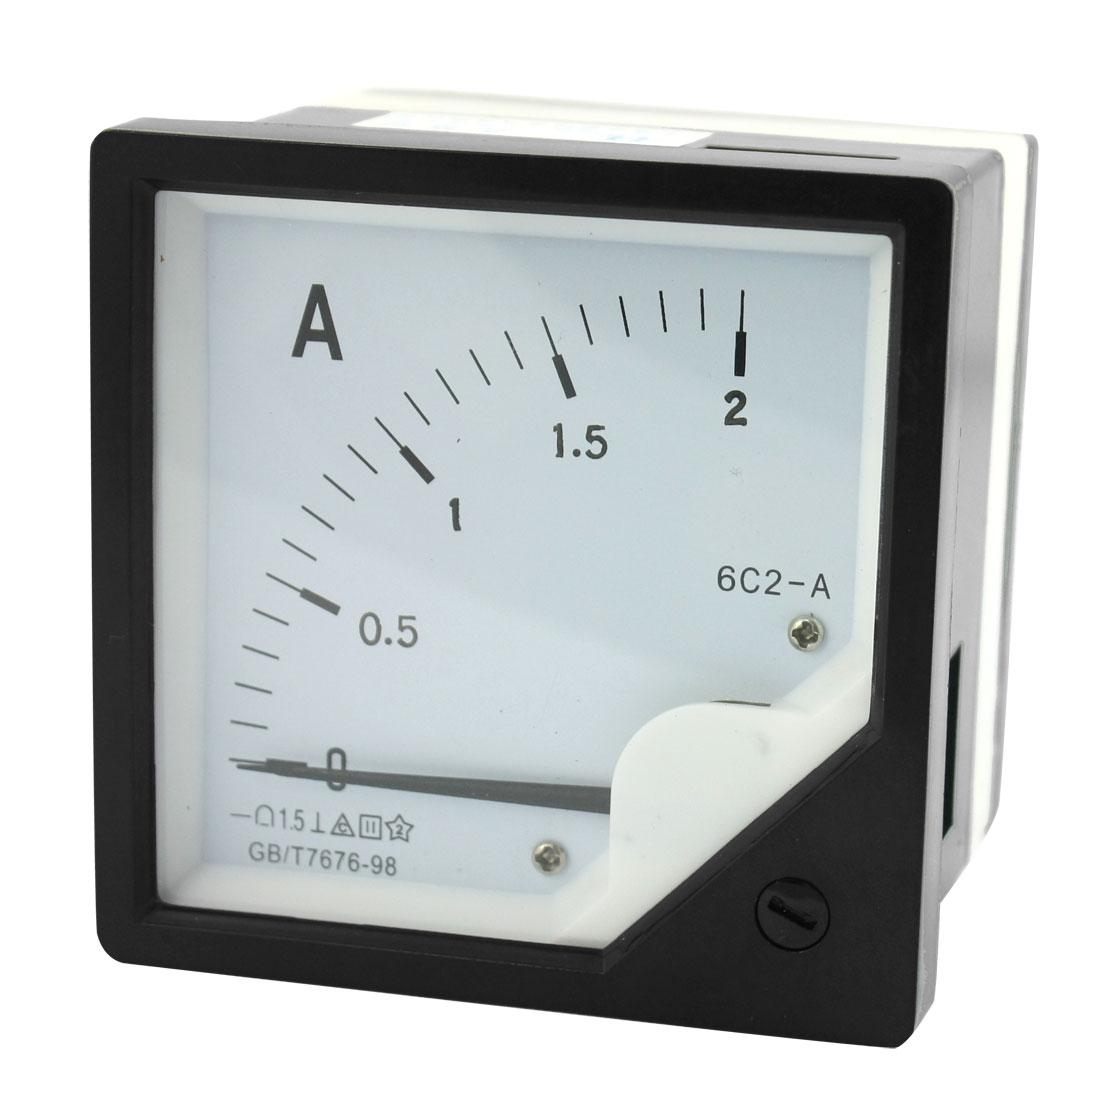 DC 0-2A Measuring Range Class 1.5 Current Testing Rectangle Plastic Panel Analog Meter Amperemeter 6C2